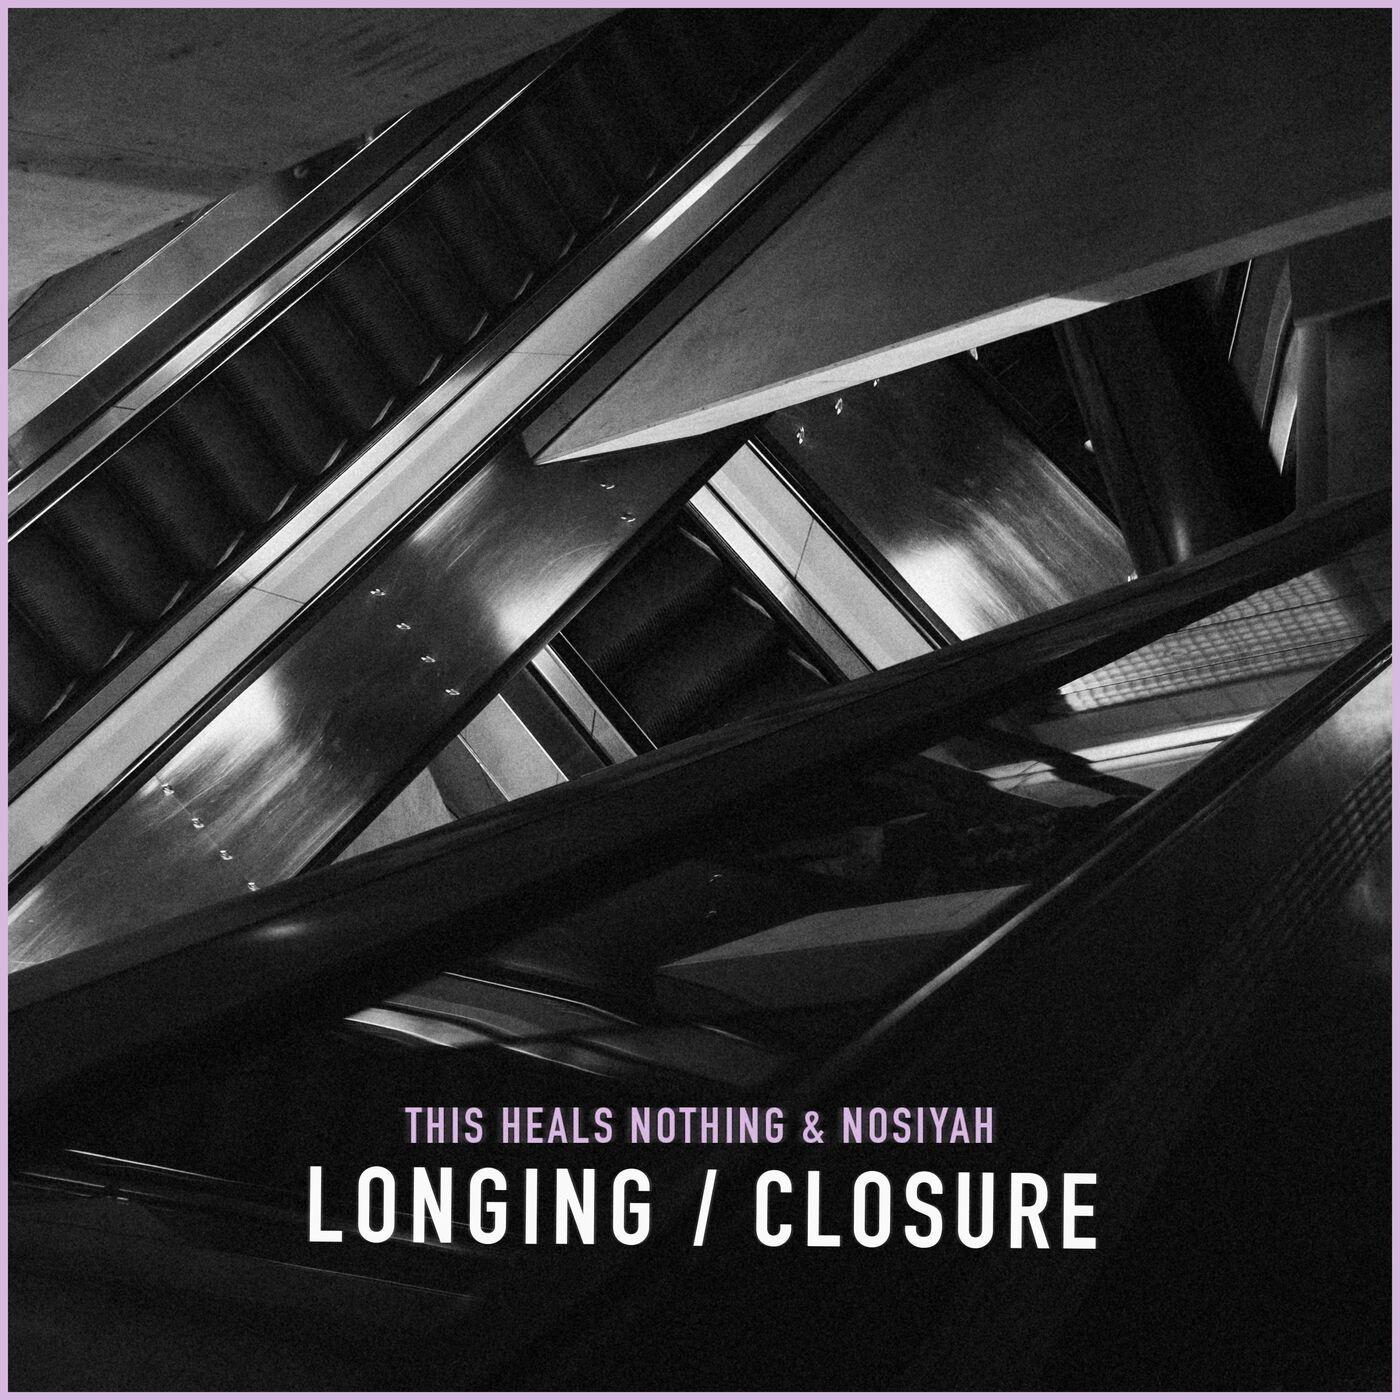 N?SIYAH & This Heals Nothing - Longing / Closure [EP] (2020)